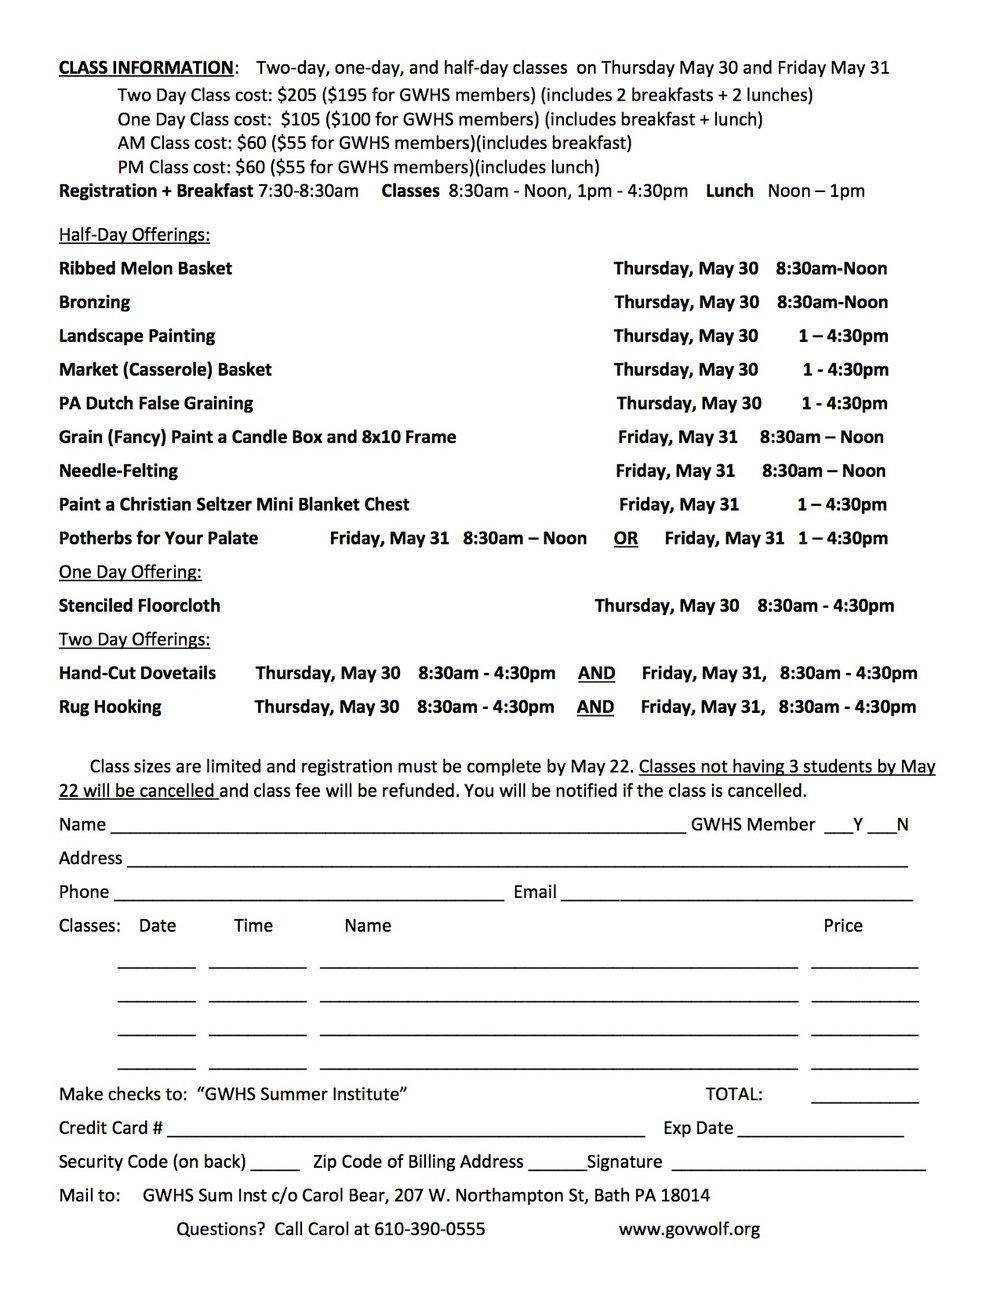 2019 list of classes - form.jpg